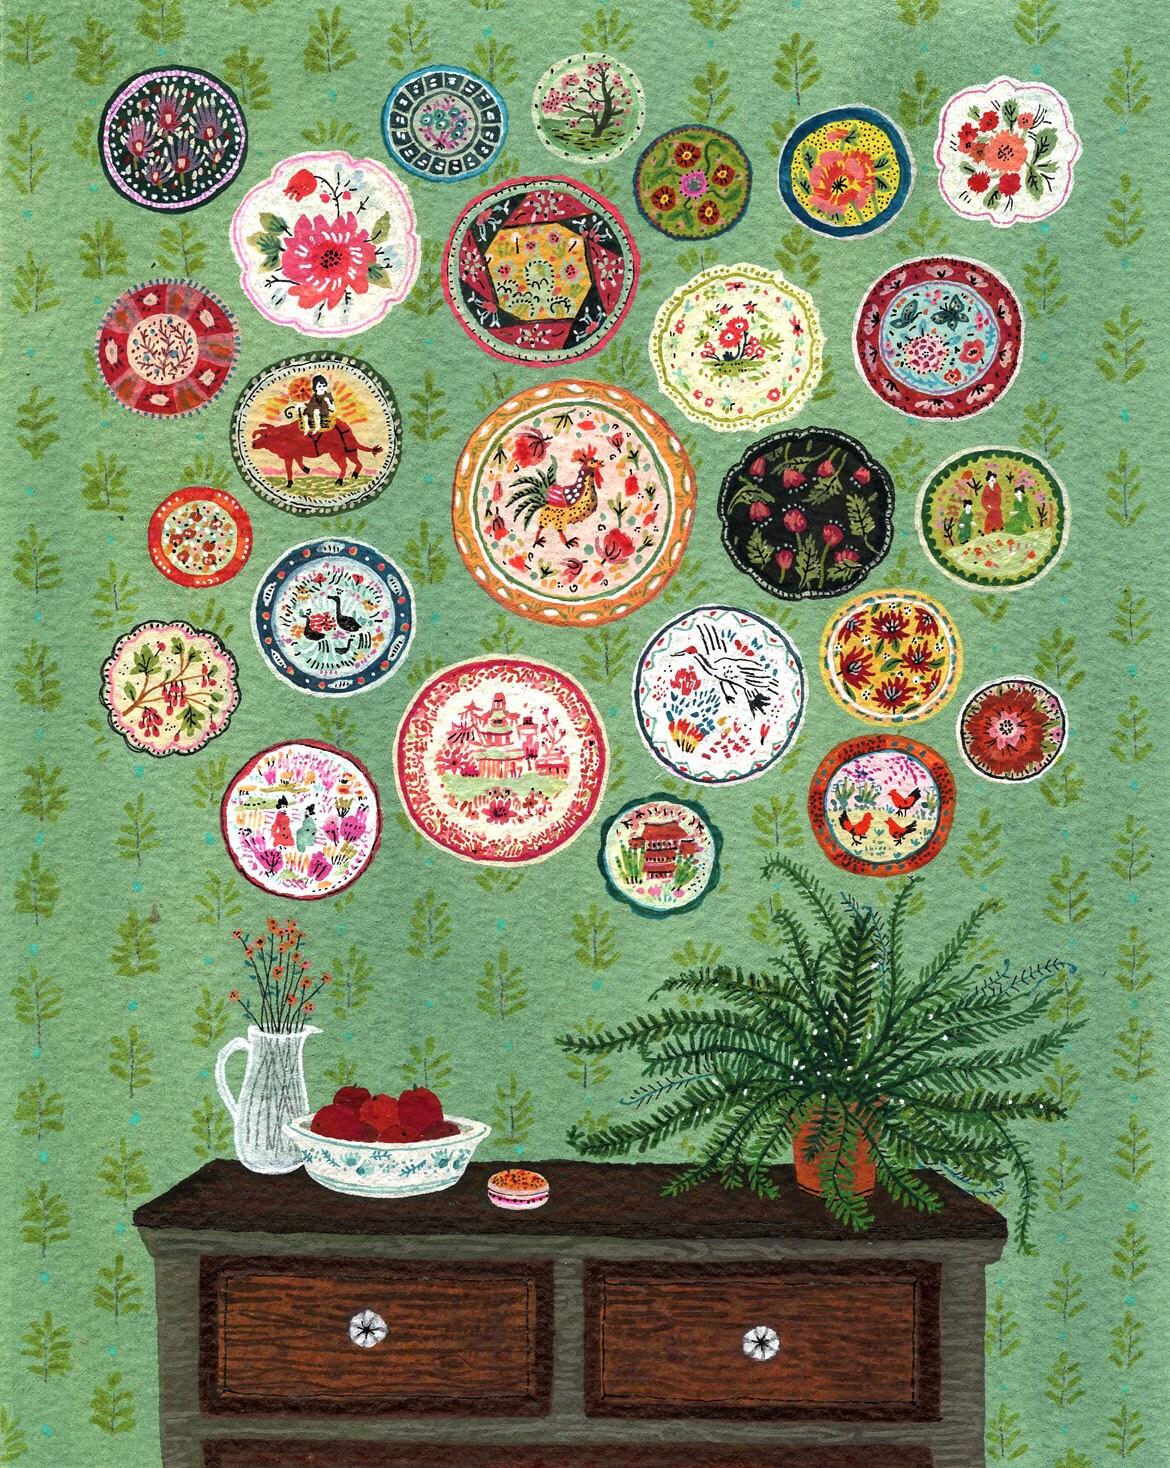 Plate Collection - beccastadtlander